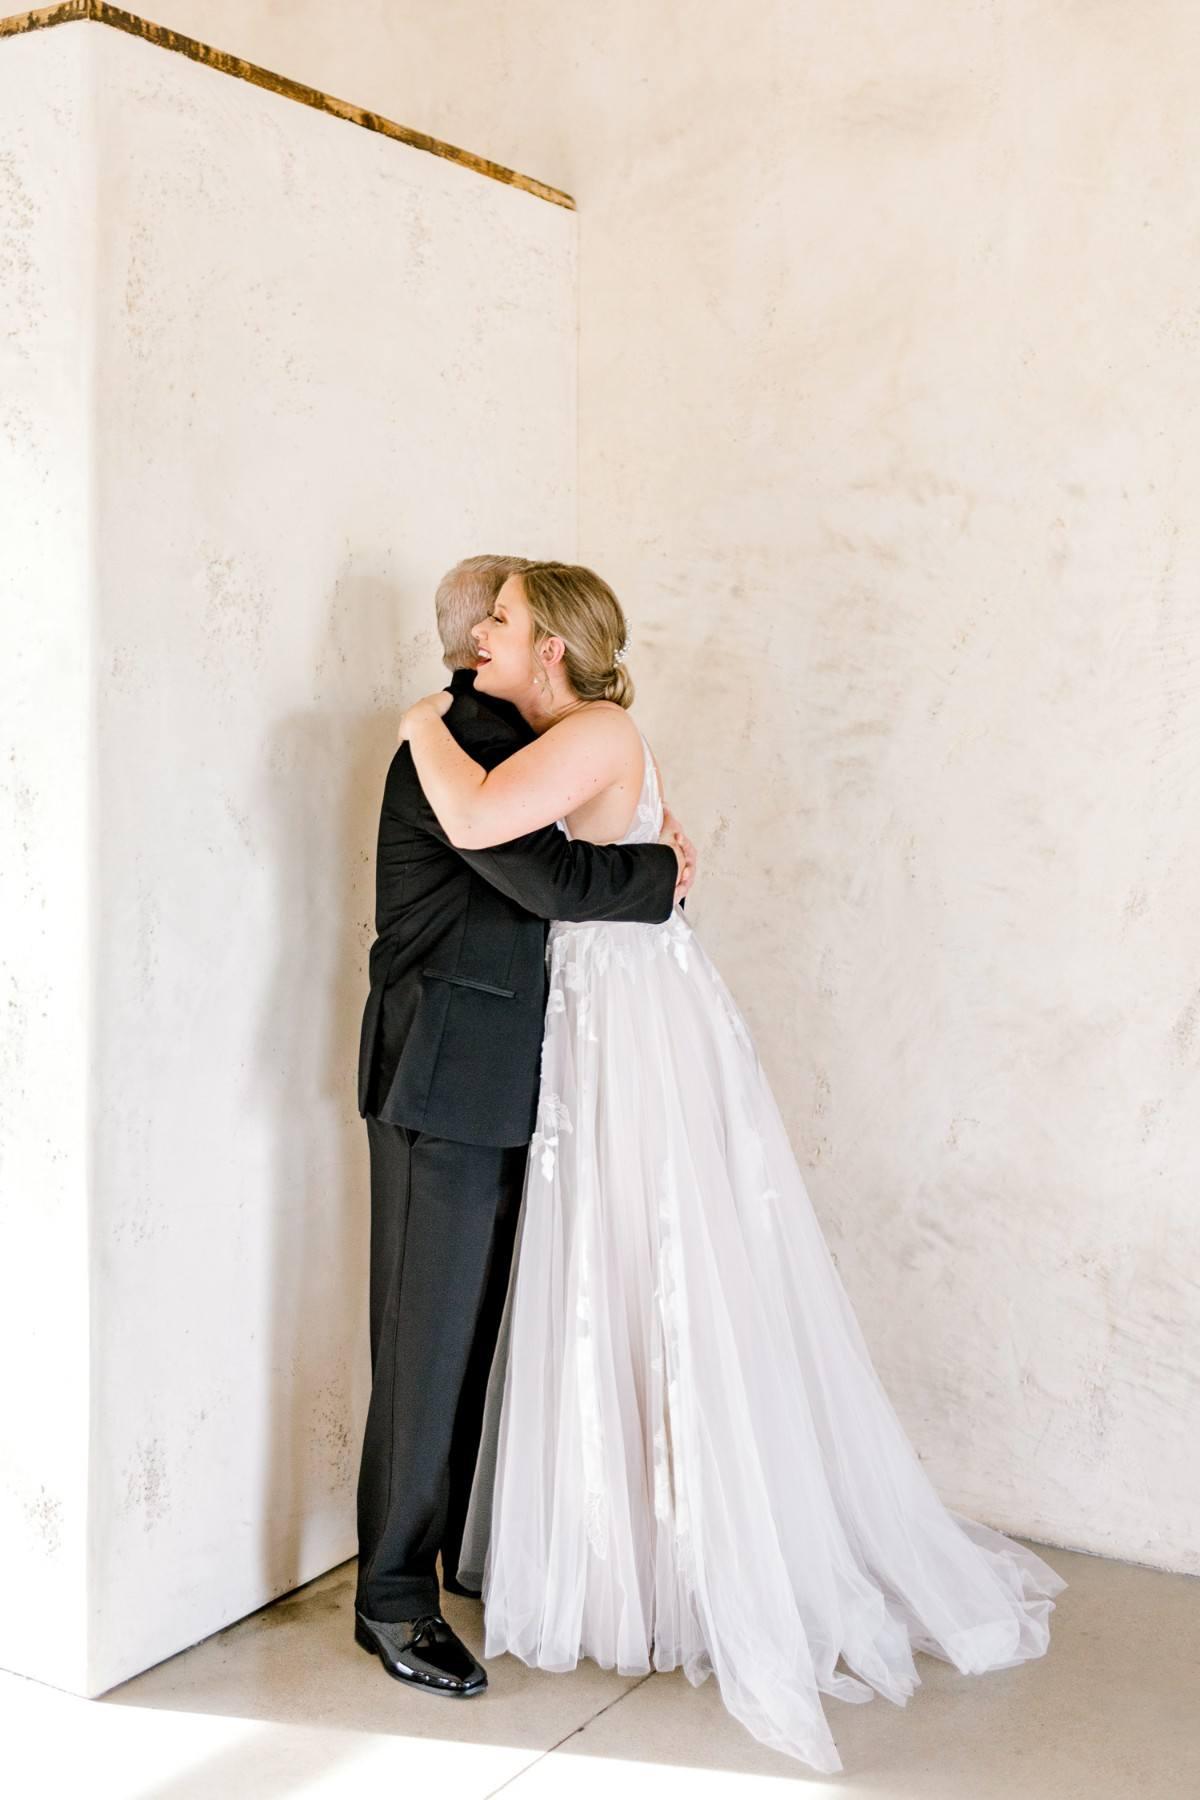 ennis-texas-wedding-photographer-kaitlyn-bullard-41.jpg